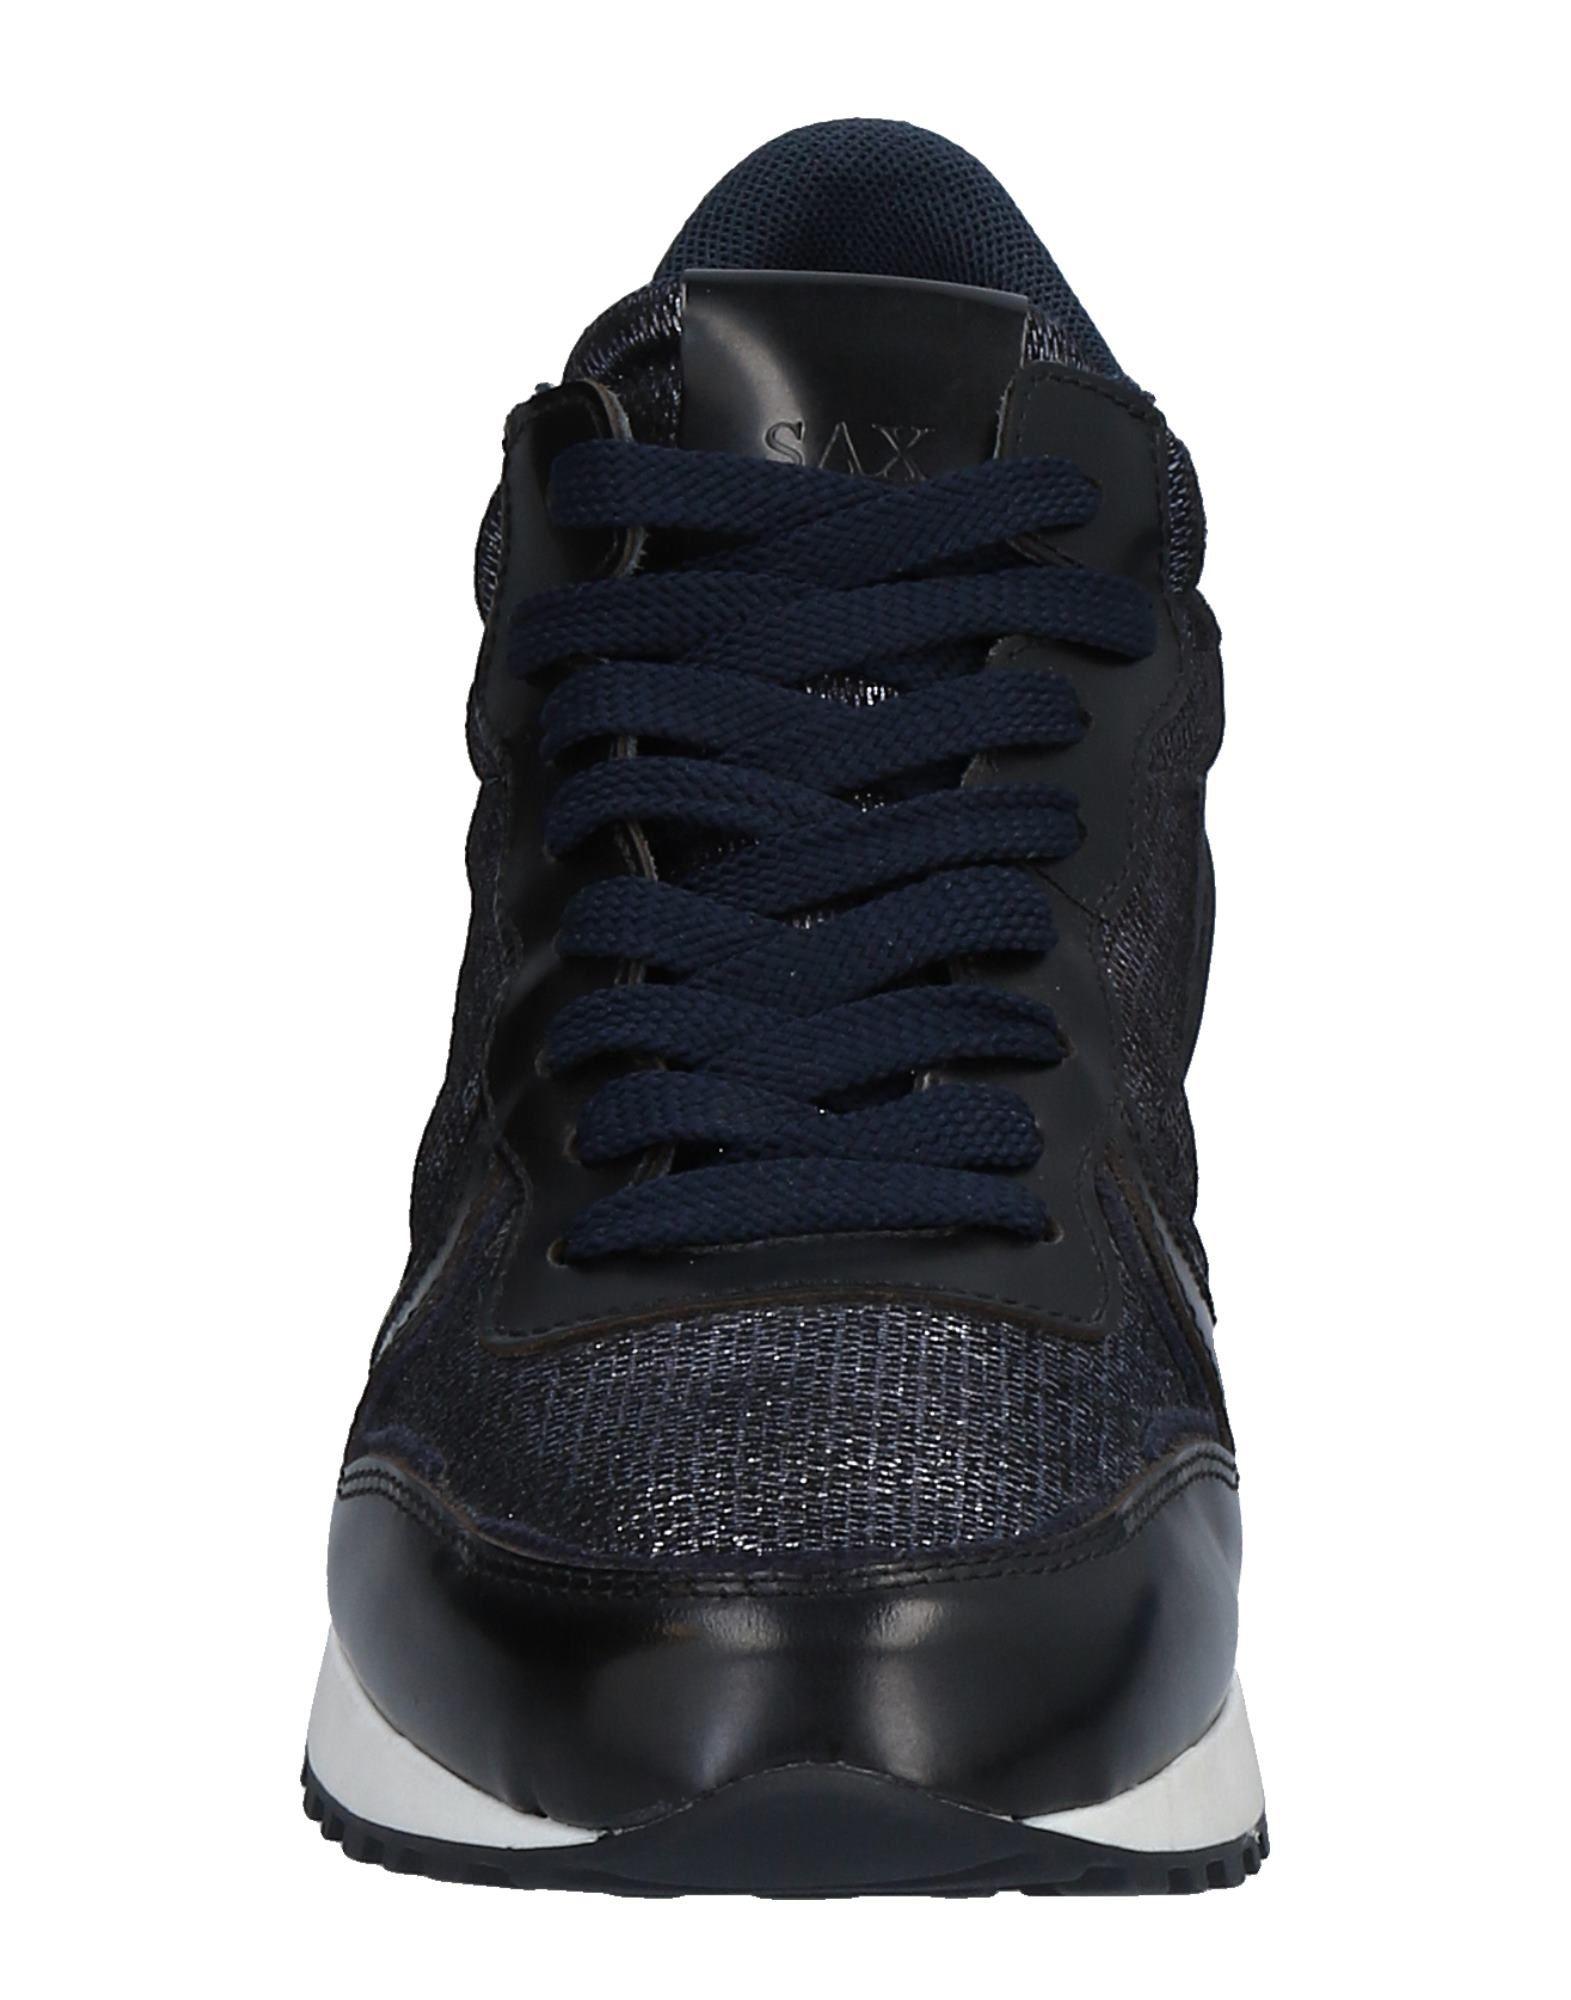 Sax Sneakers Damen  11518190AB   11518190AB 3fa766